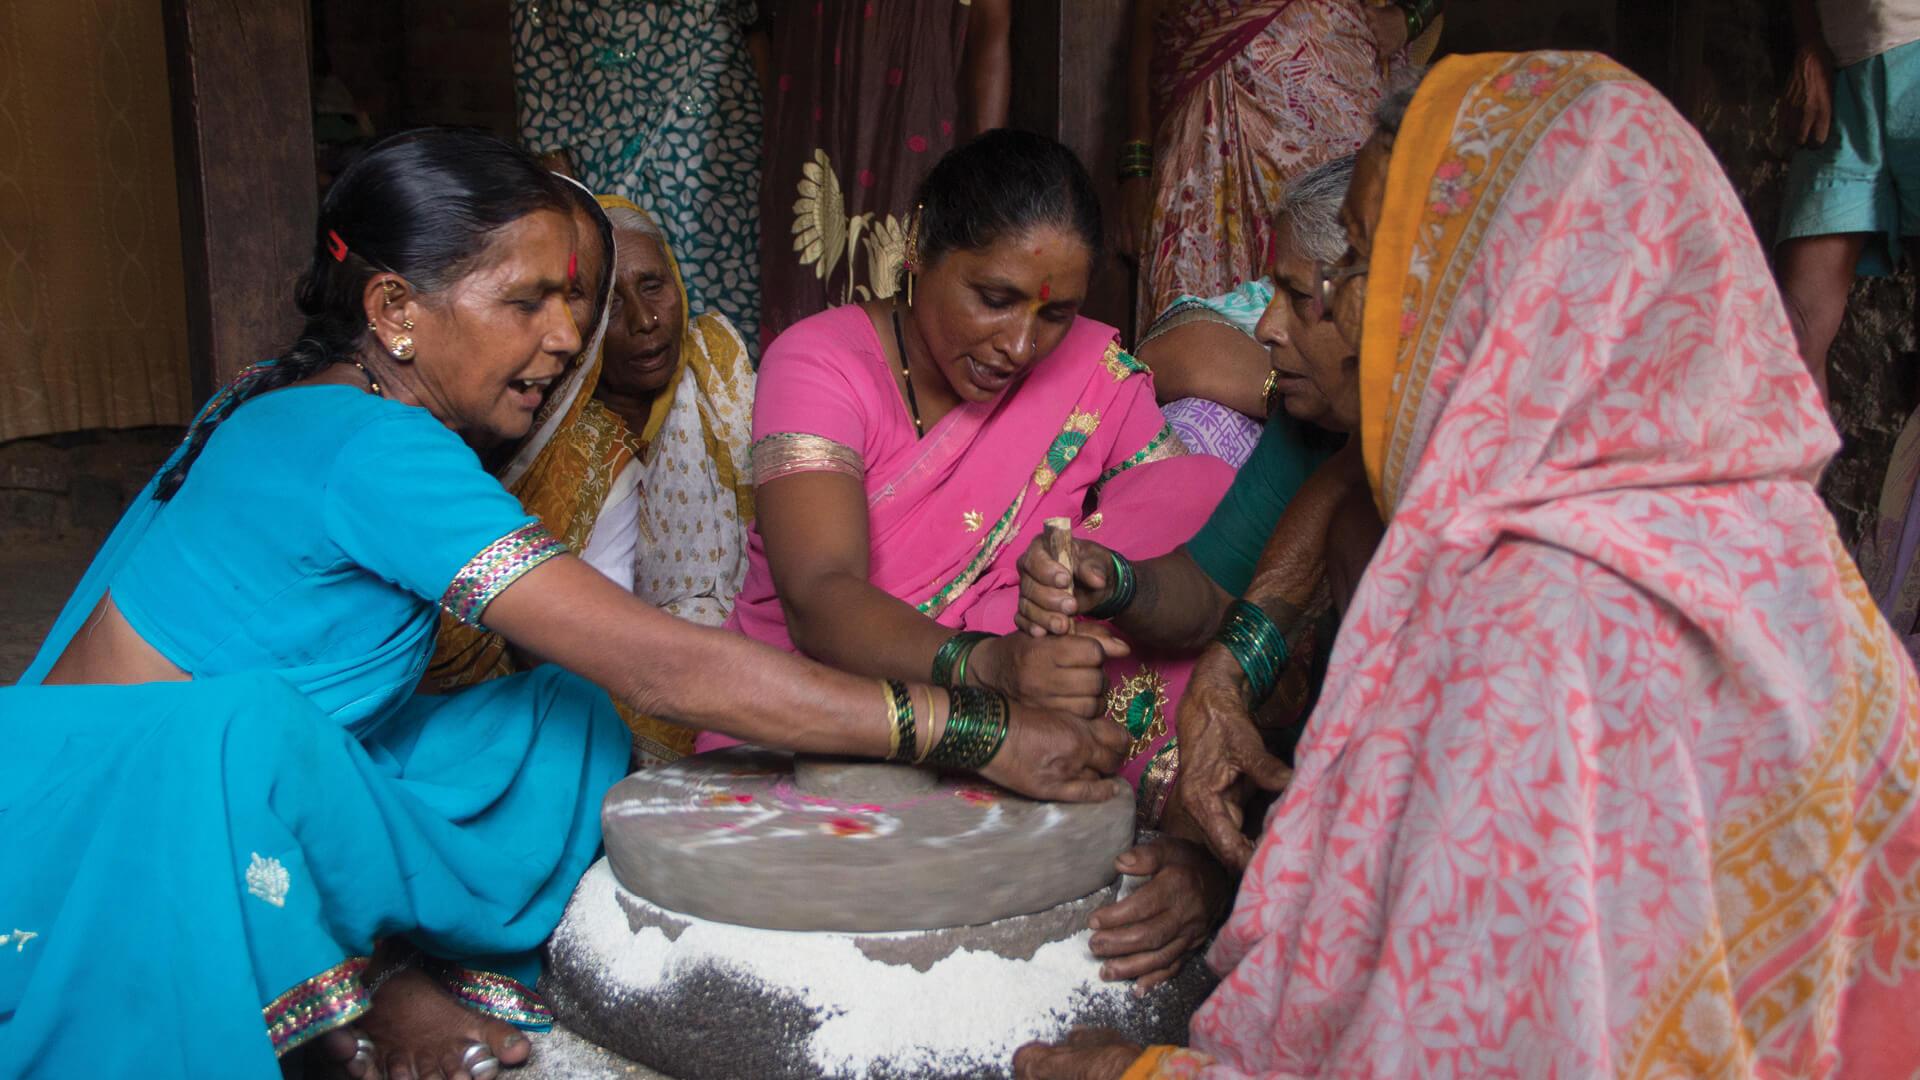 Many women in rural Maharashtra sang songs while grinding grain| Sinchita Maji | STIRworld